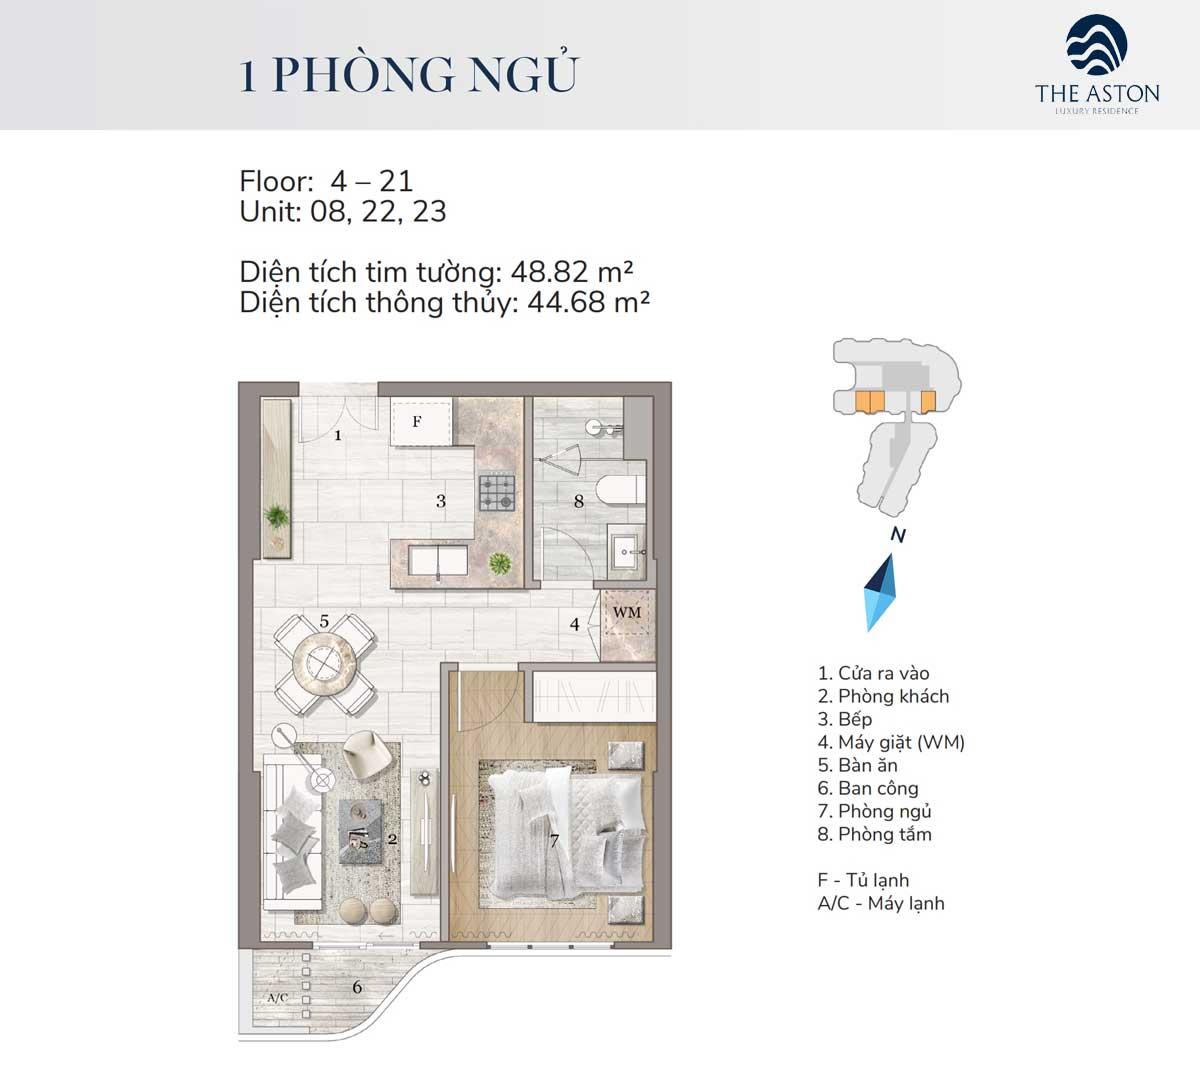 The-Aston-Luxury-Residence-Nha-Trang-thiet-ke-can-ho-phong-ngu